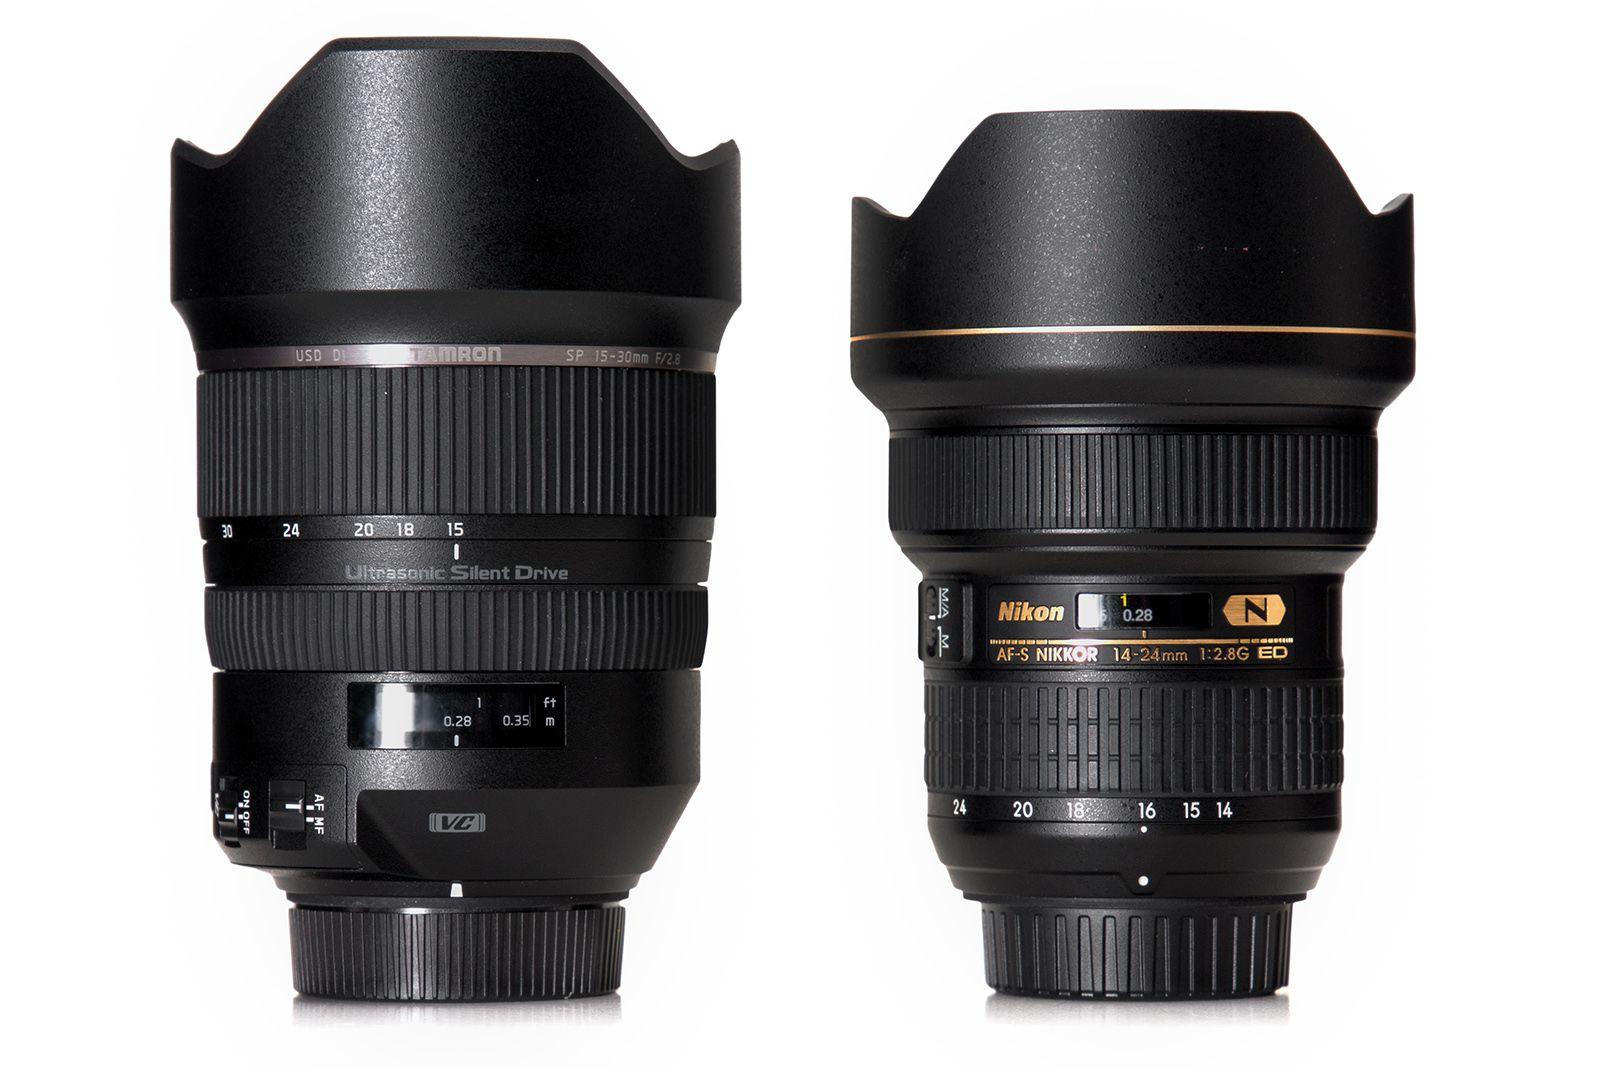 Prepare To Be Impressed Tamron 15 30 F2 8 Vs Nikon 14 24 F2 8